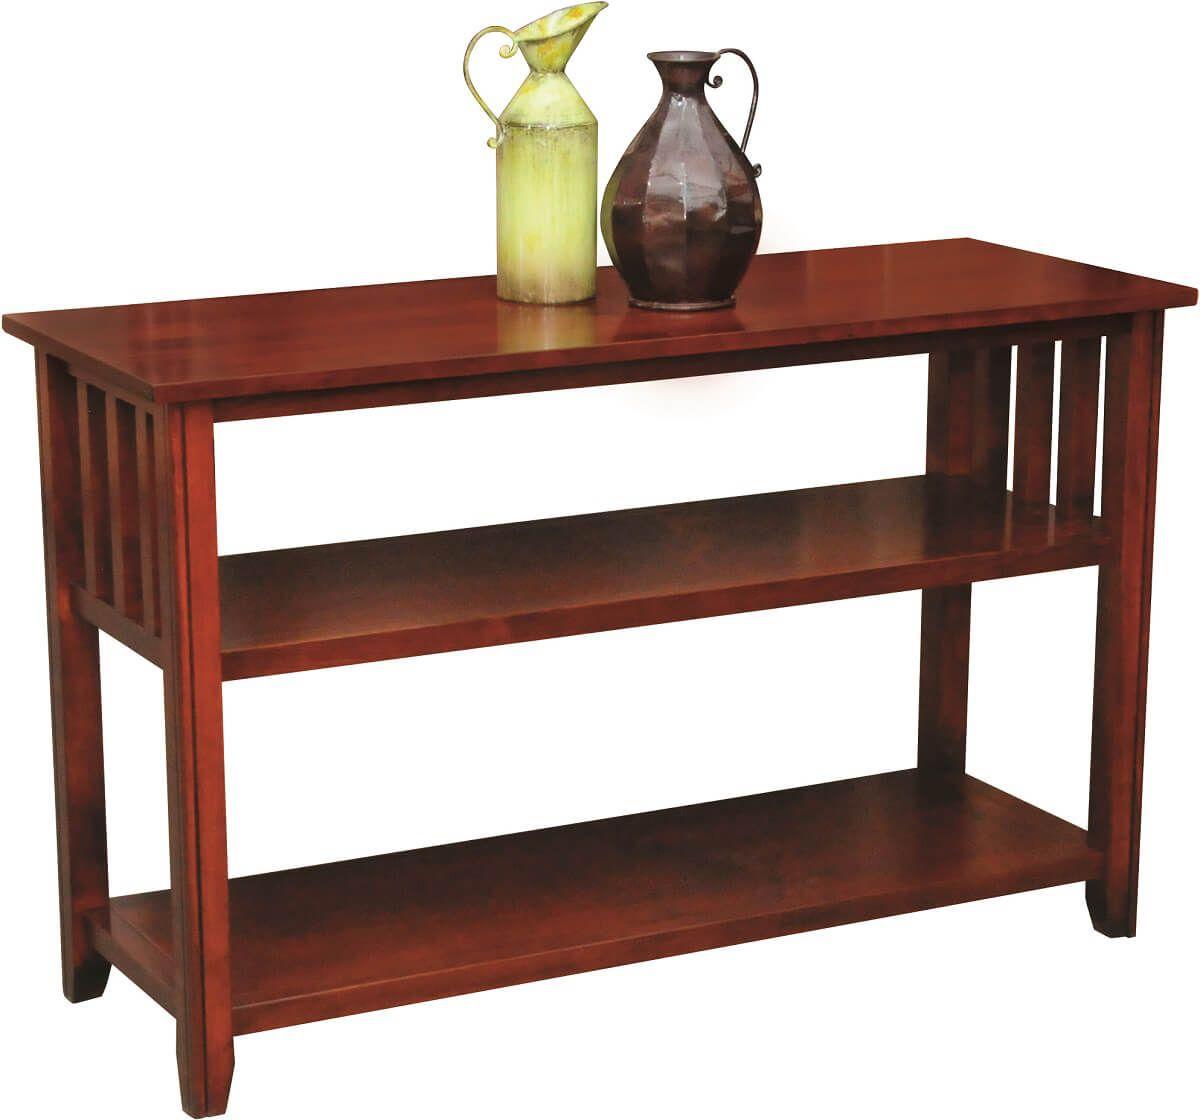 Aldora Console Table in Brown Maple